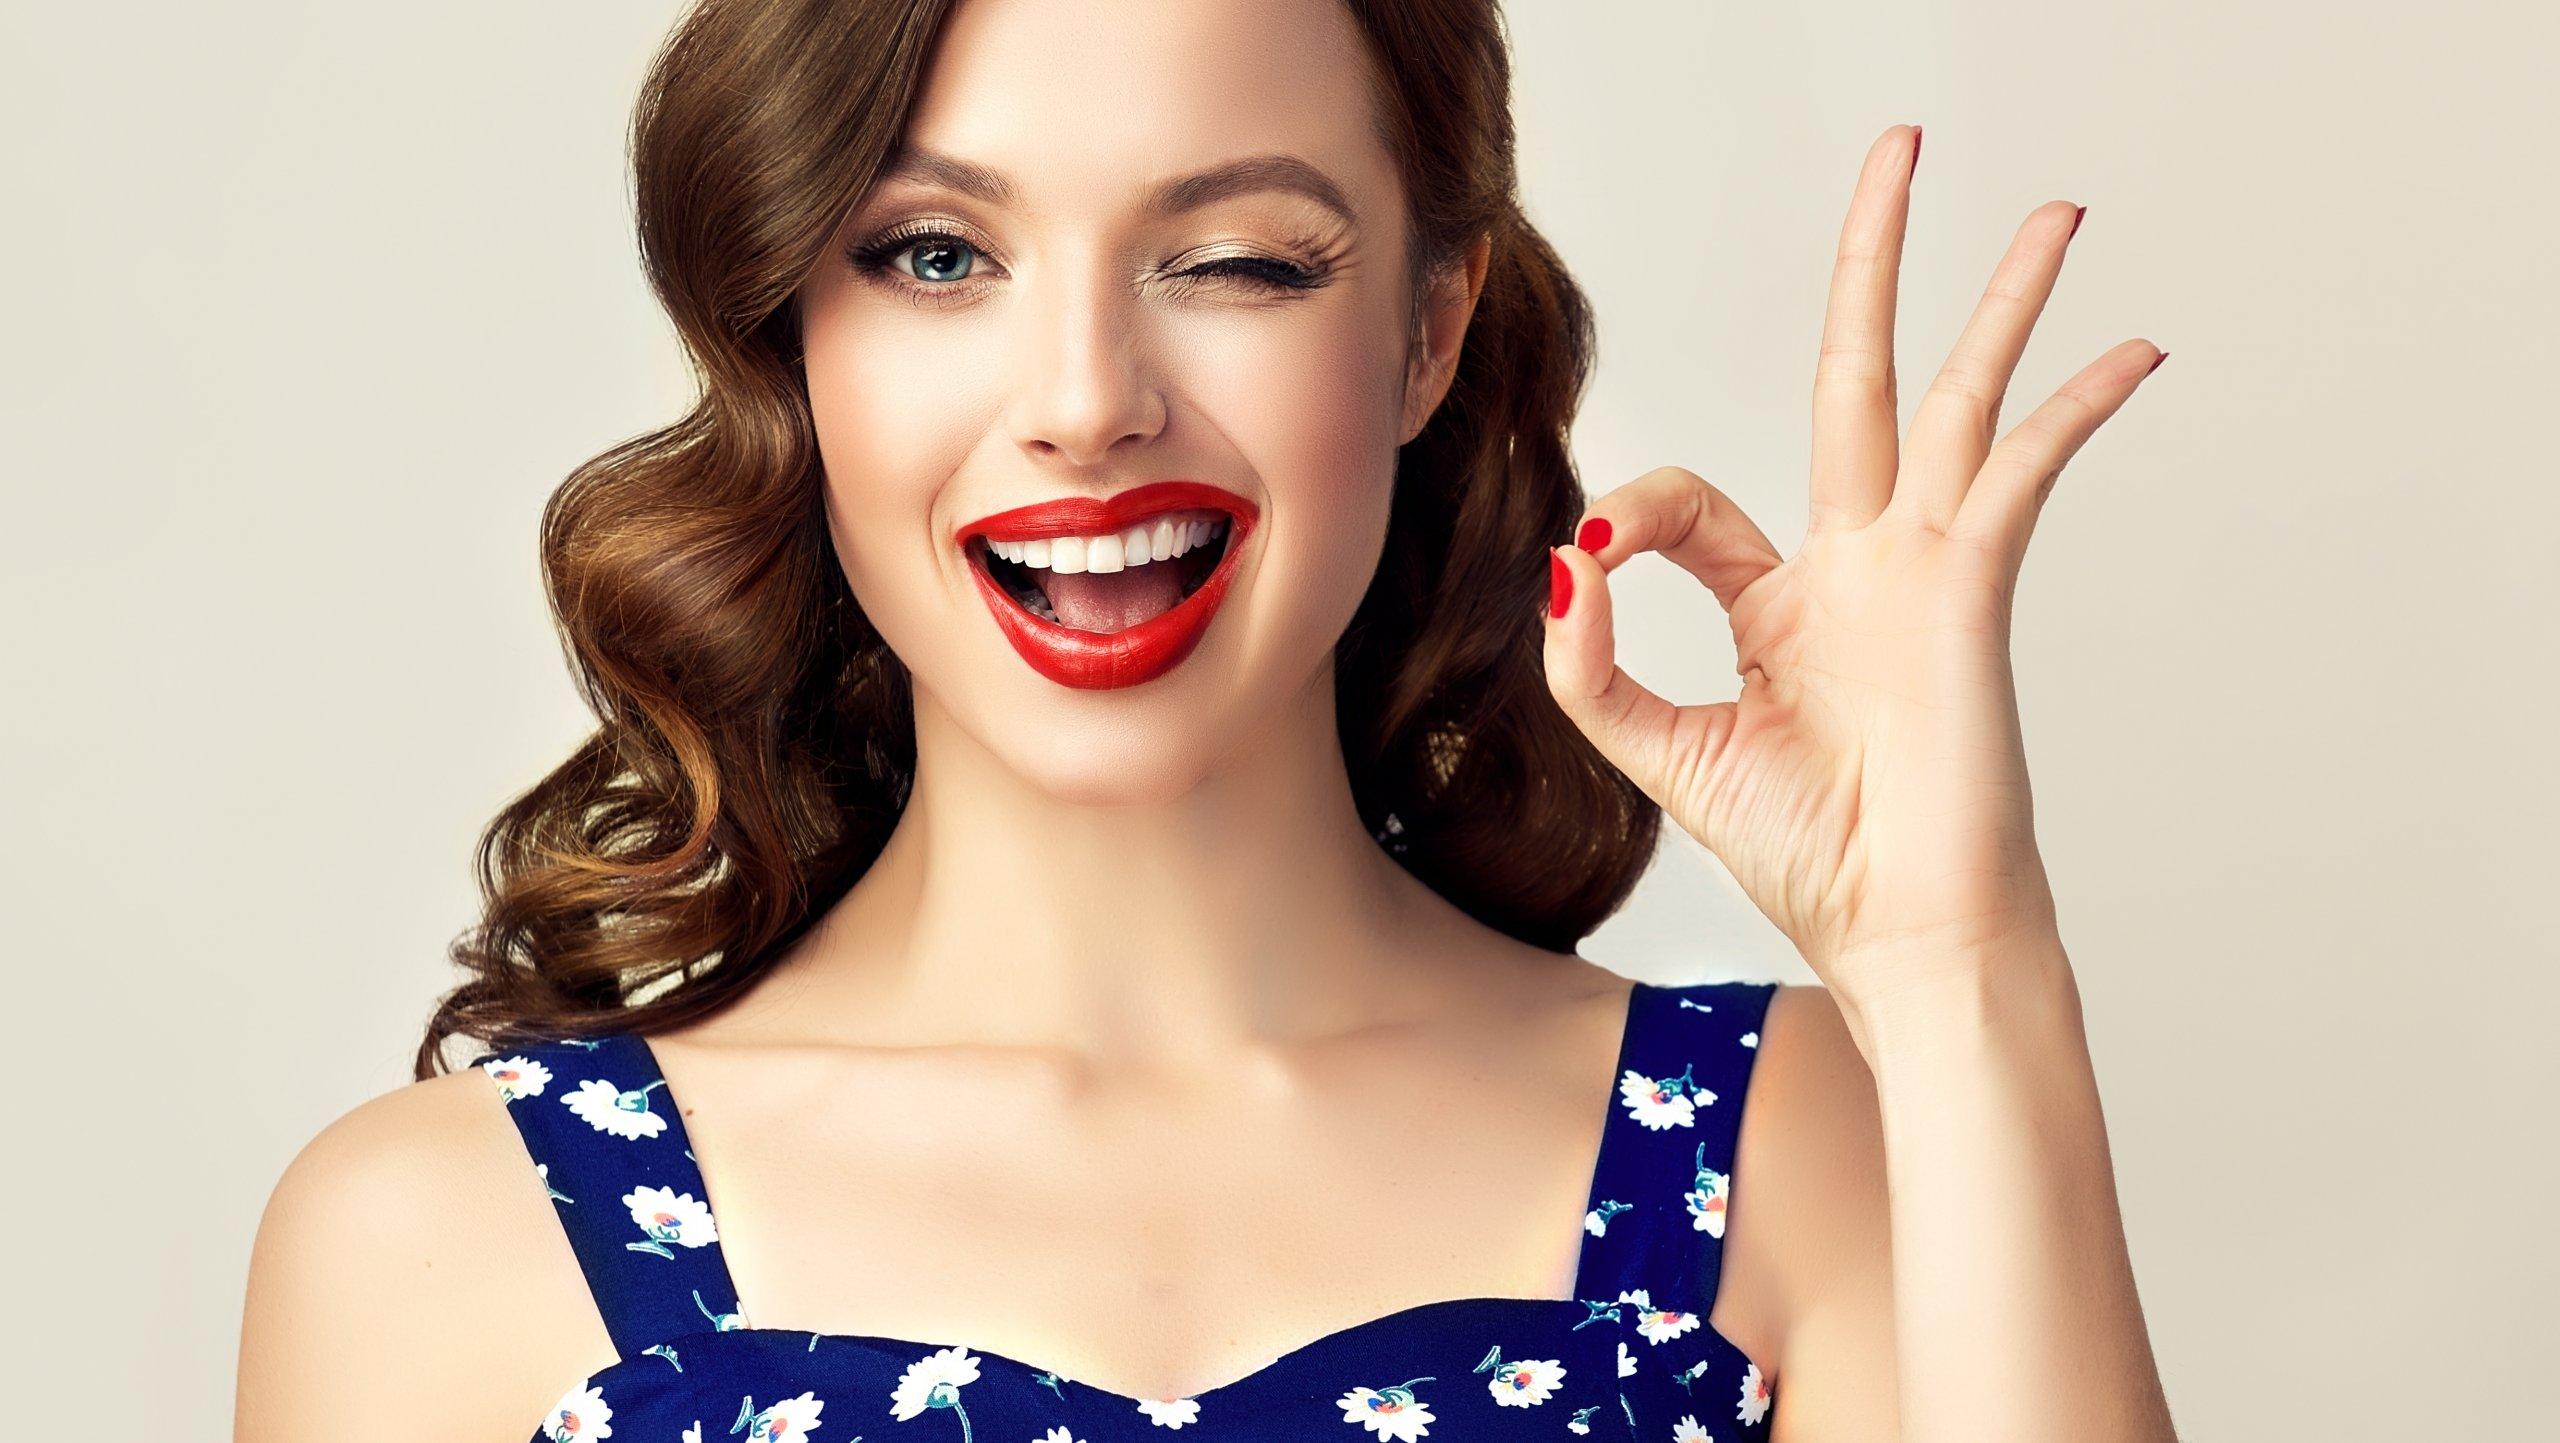 Weird But Common Cosmetic Procedures